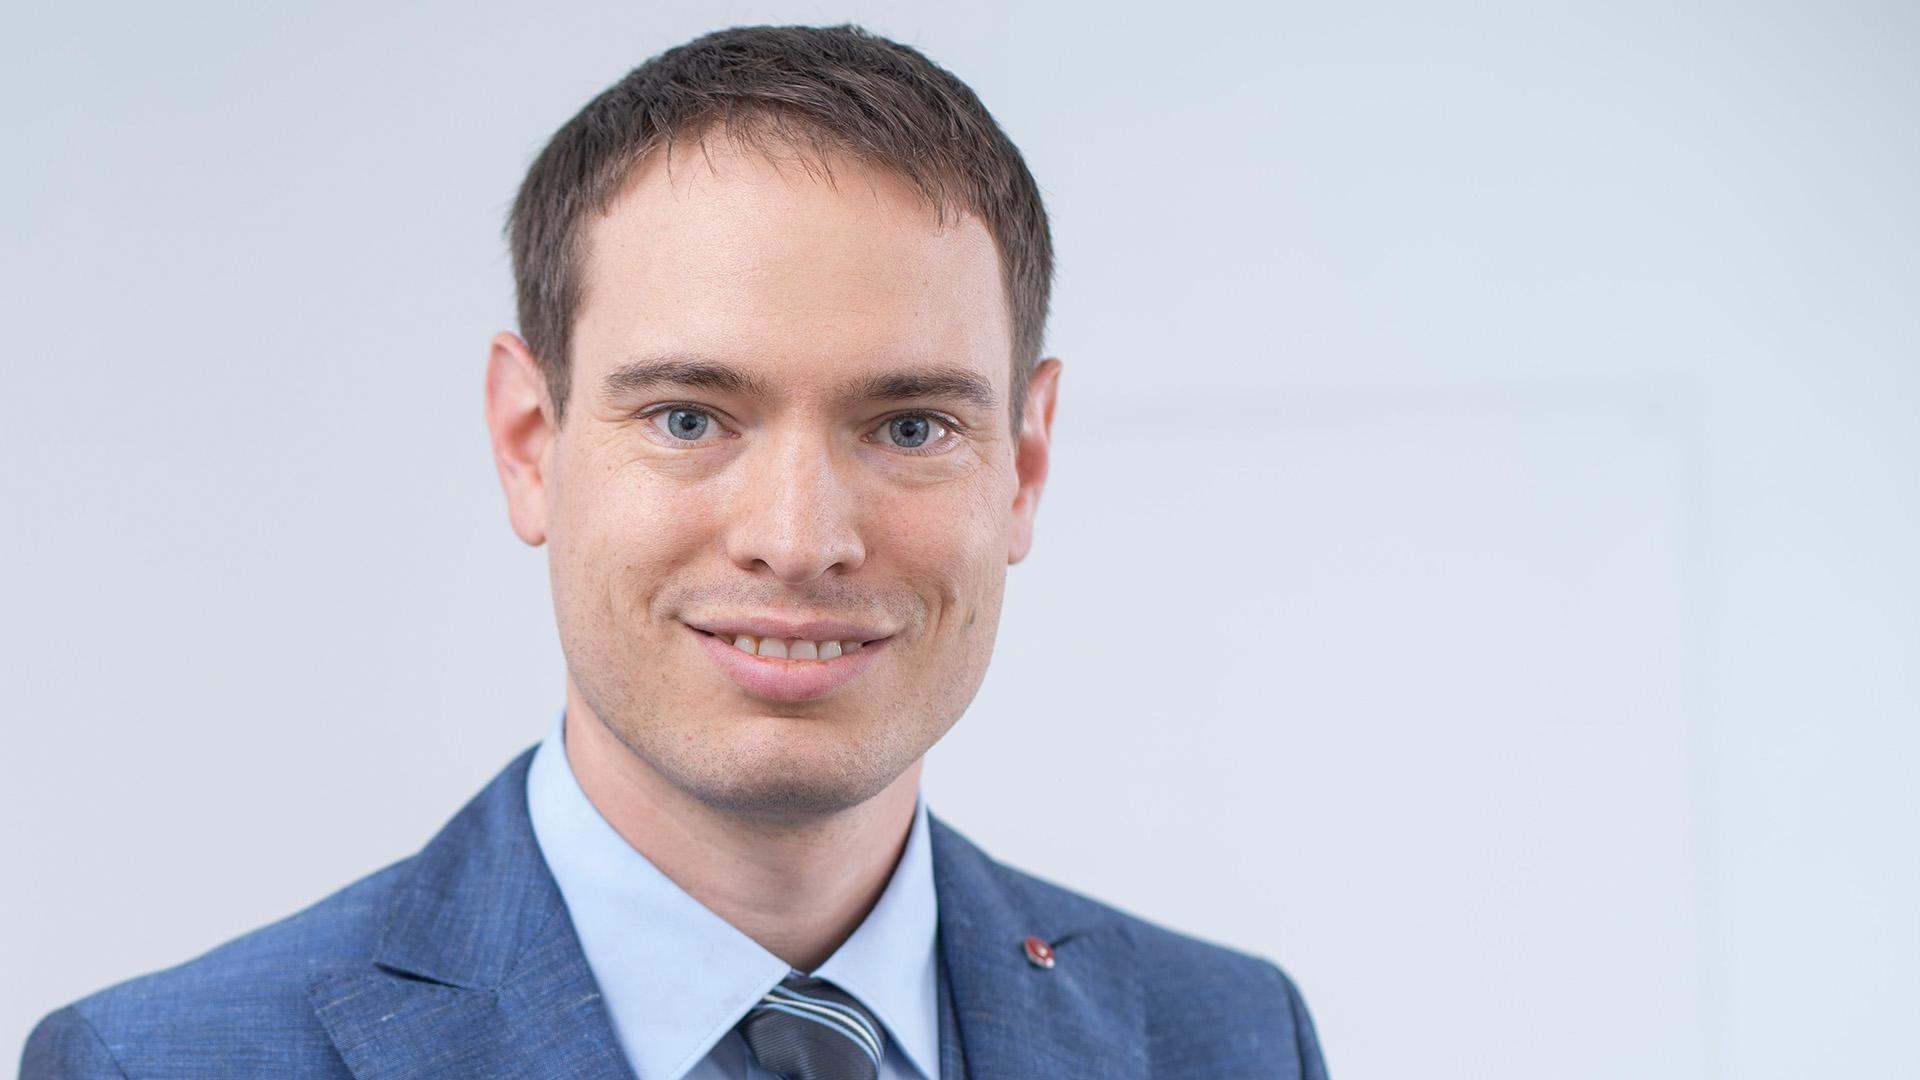 Daniel Beier